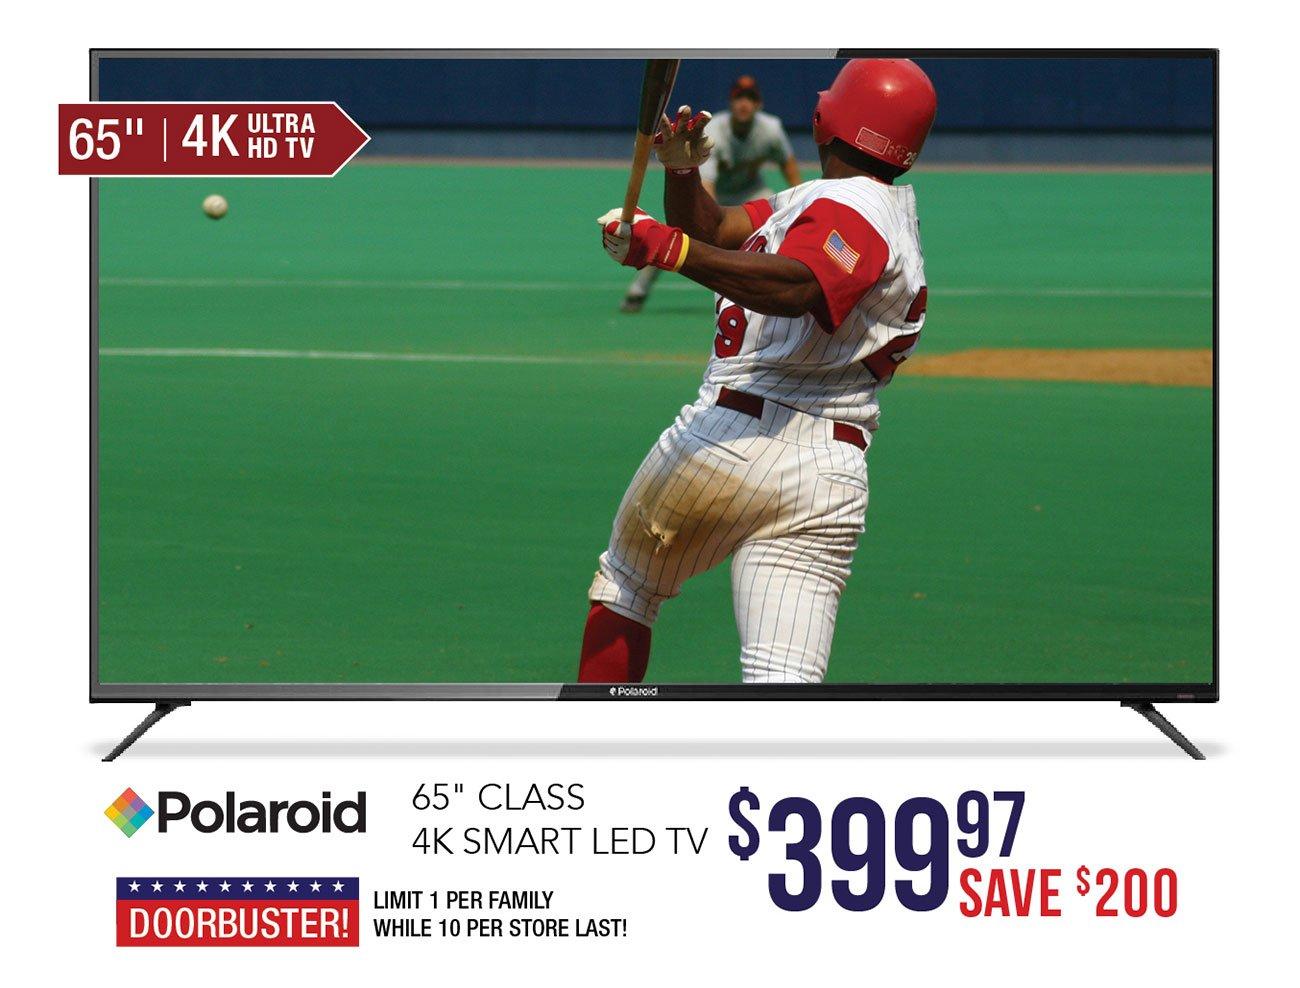 Polaroid-65-inch-led-tv